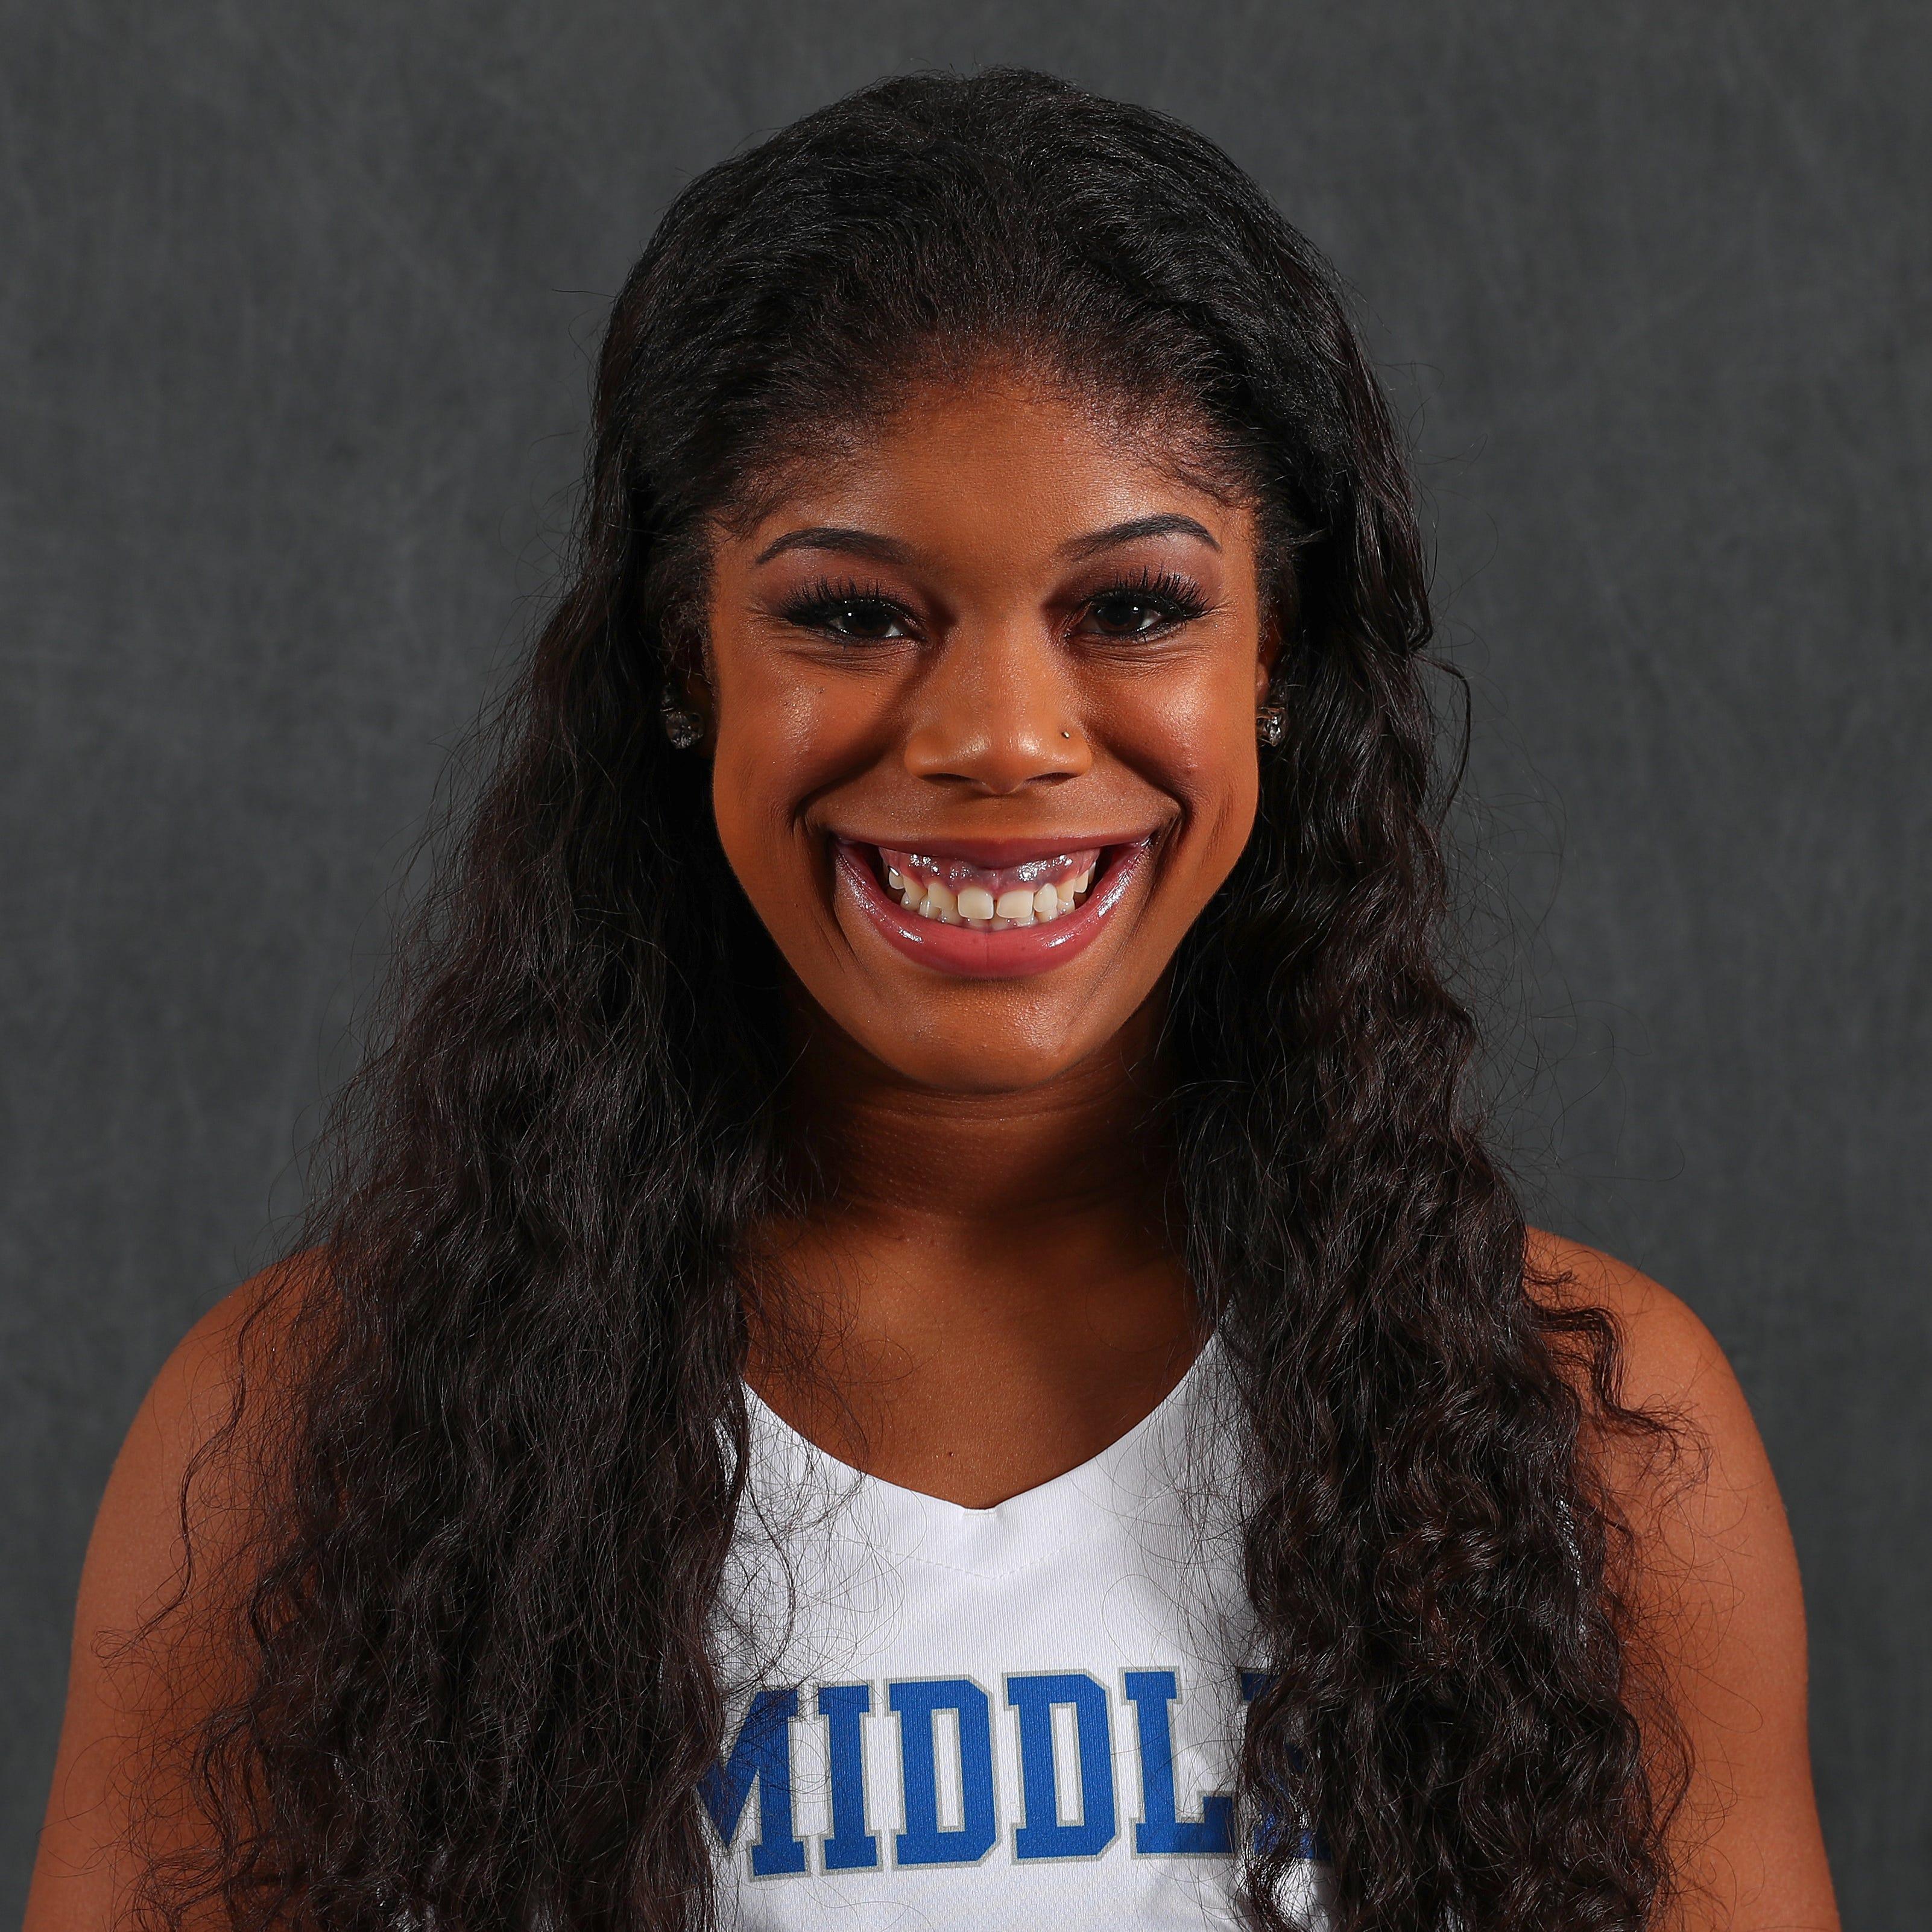 MTSU women's basketball player Mykia Dowdell